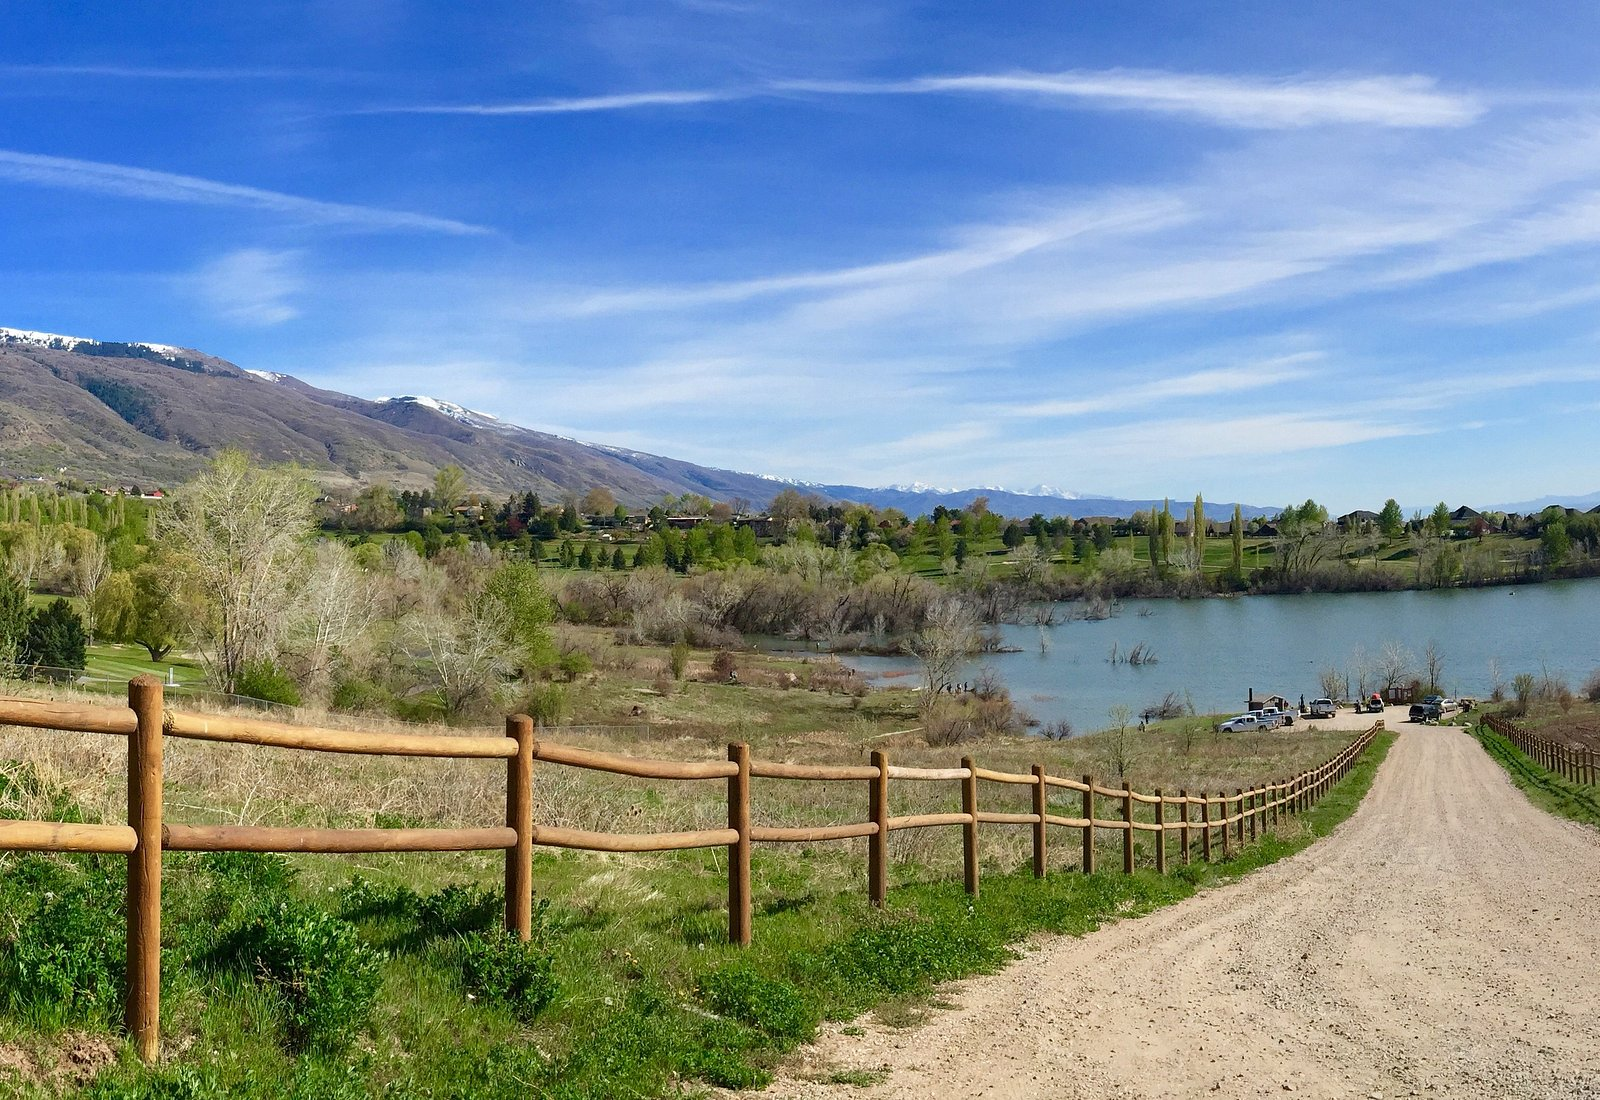 Andy Adams Park & Reservoir